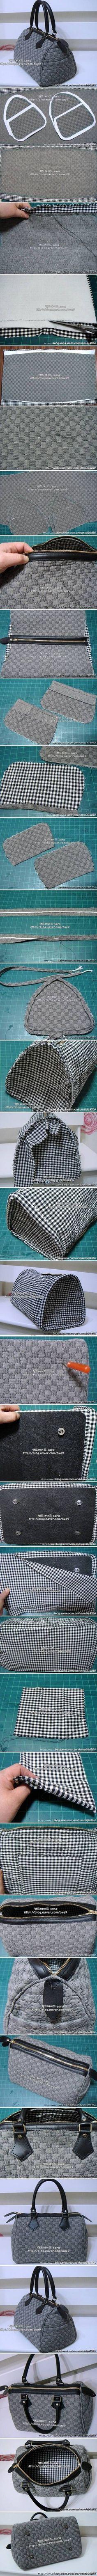 DIY Nice Fashionable Handbag fashion